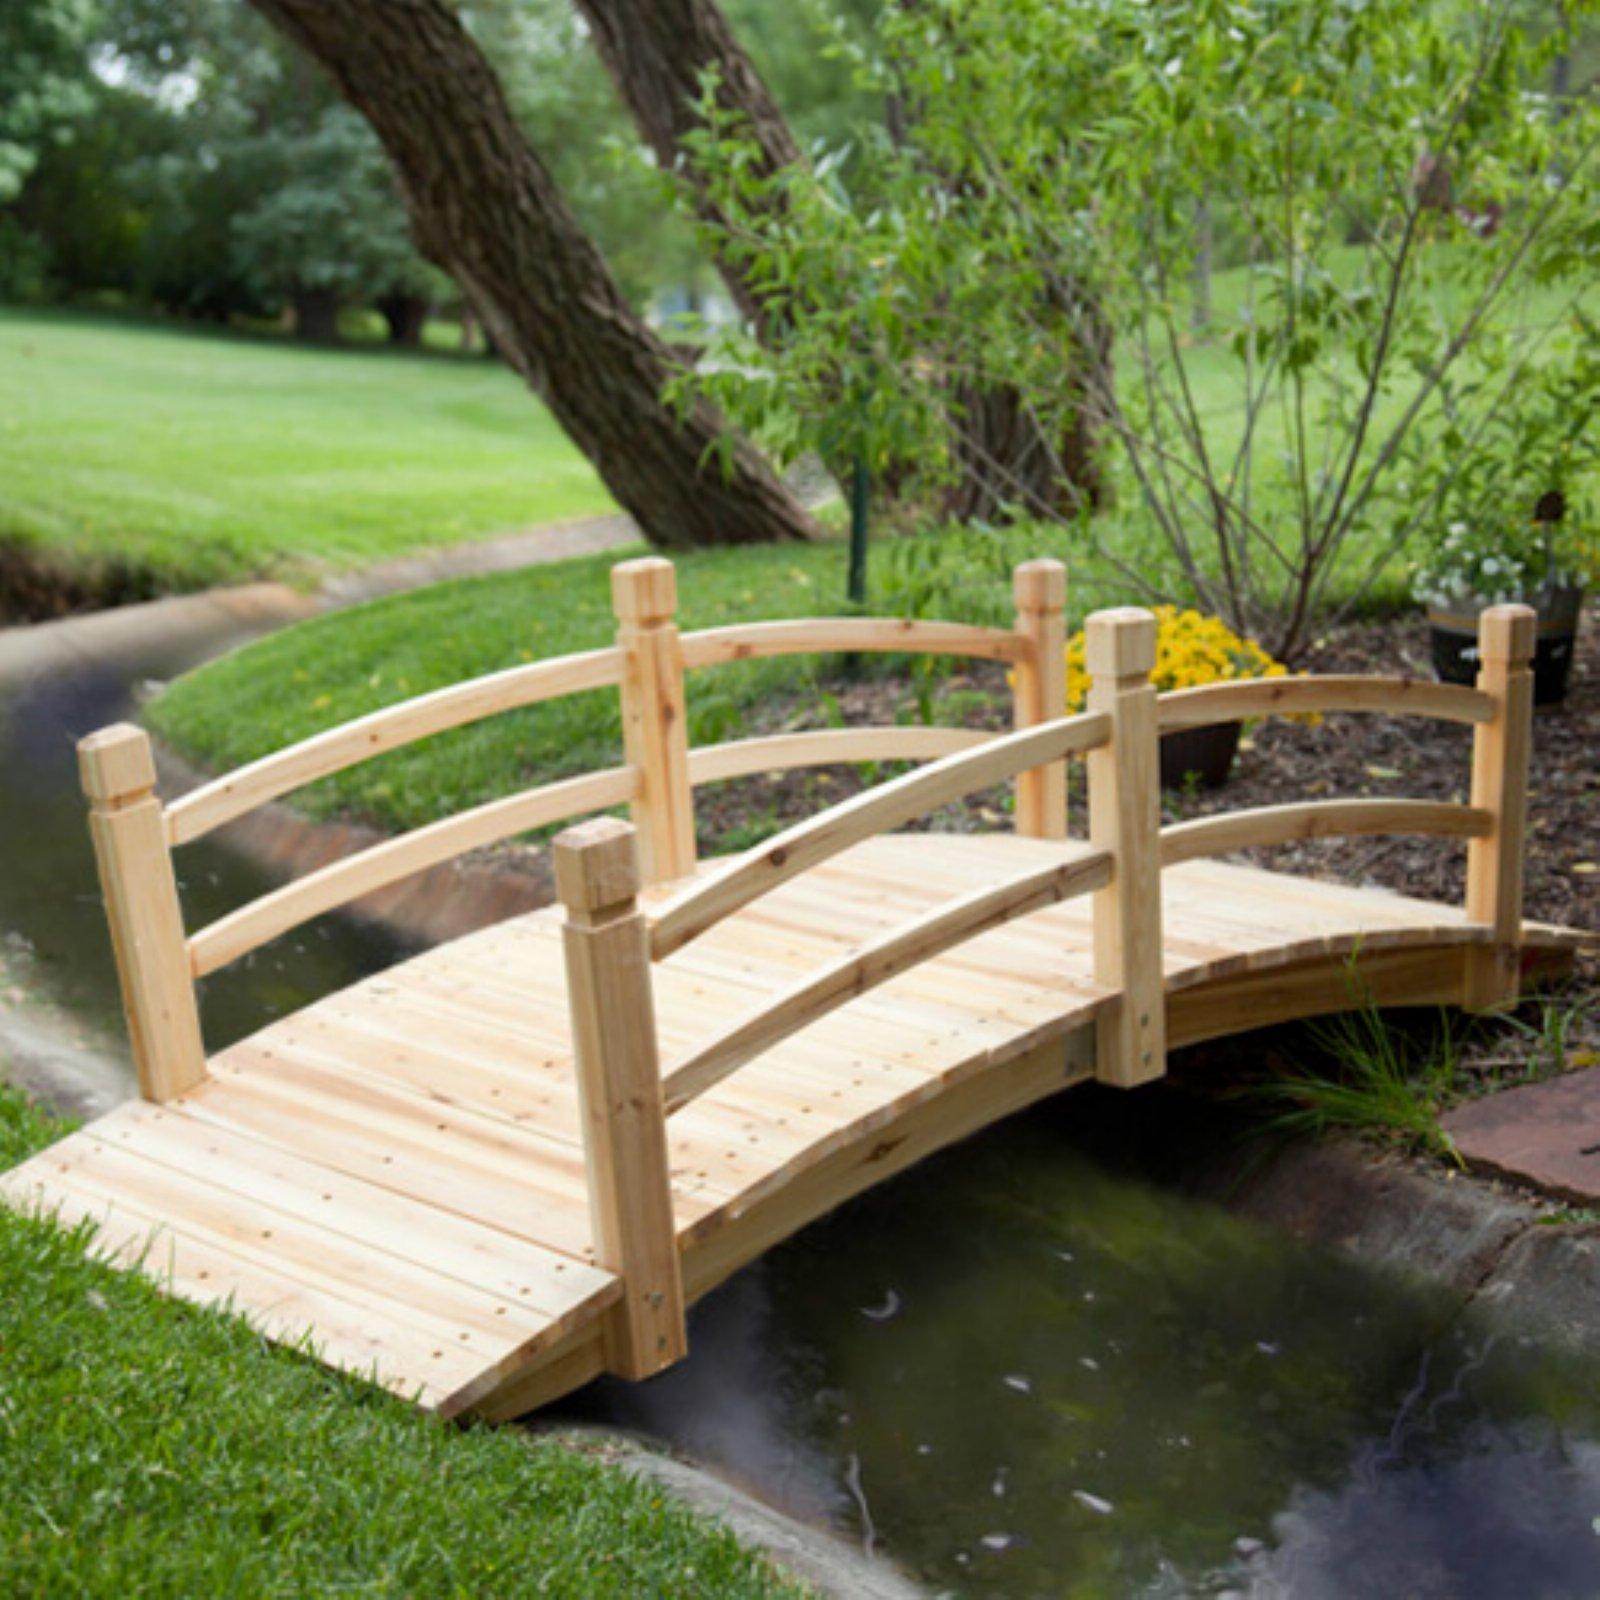 Natural Wood Finish 72'' Garden Bridge Outdoor Yard Lawn Landscaping Decor